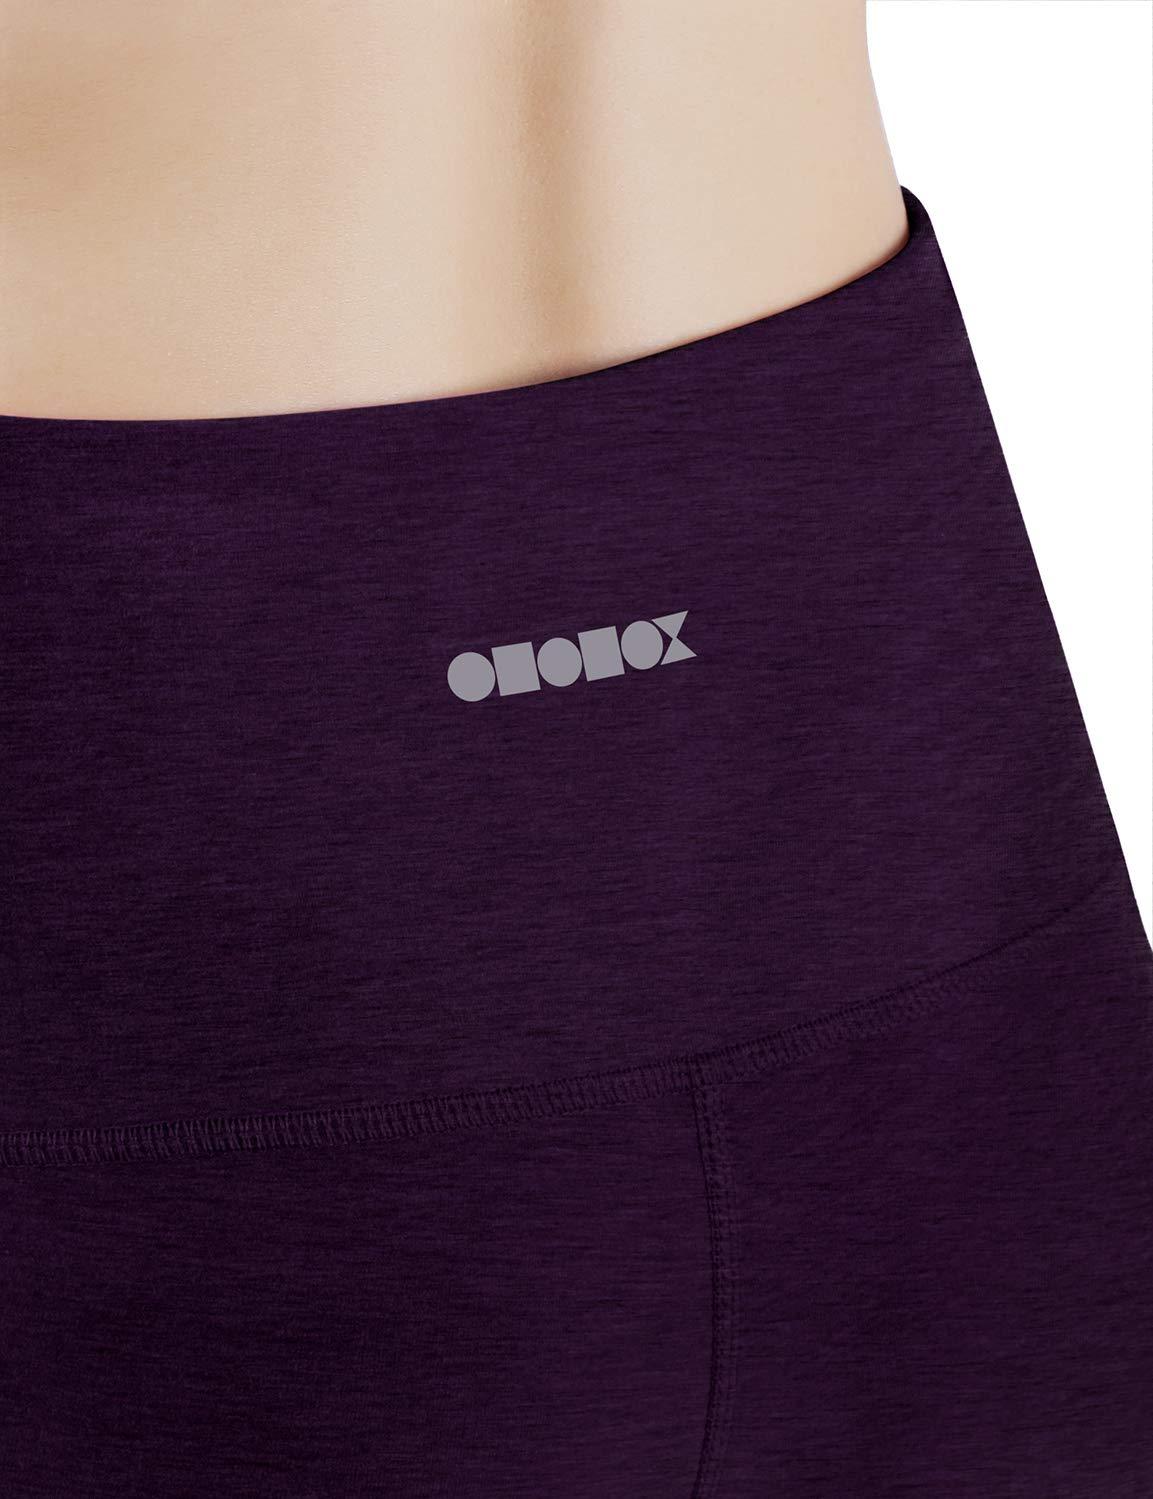 ODODOS High Waist Out Pocket Yoga Capris Pants Tummy Control Workout Running 4 Way Stretch Yoga Leggings,DeepPurple,X-Small by ODODOS (Image #5)